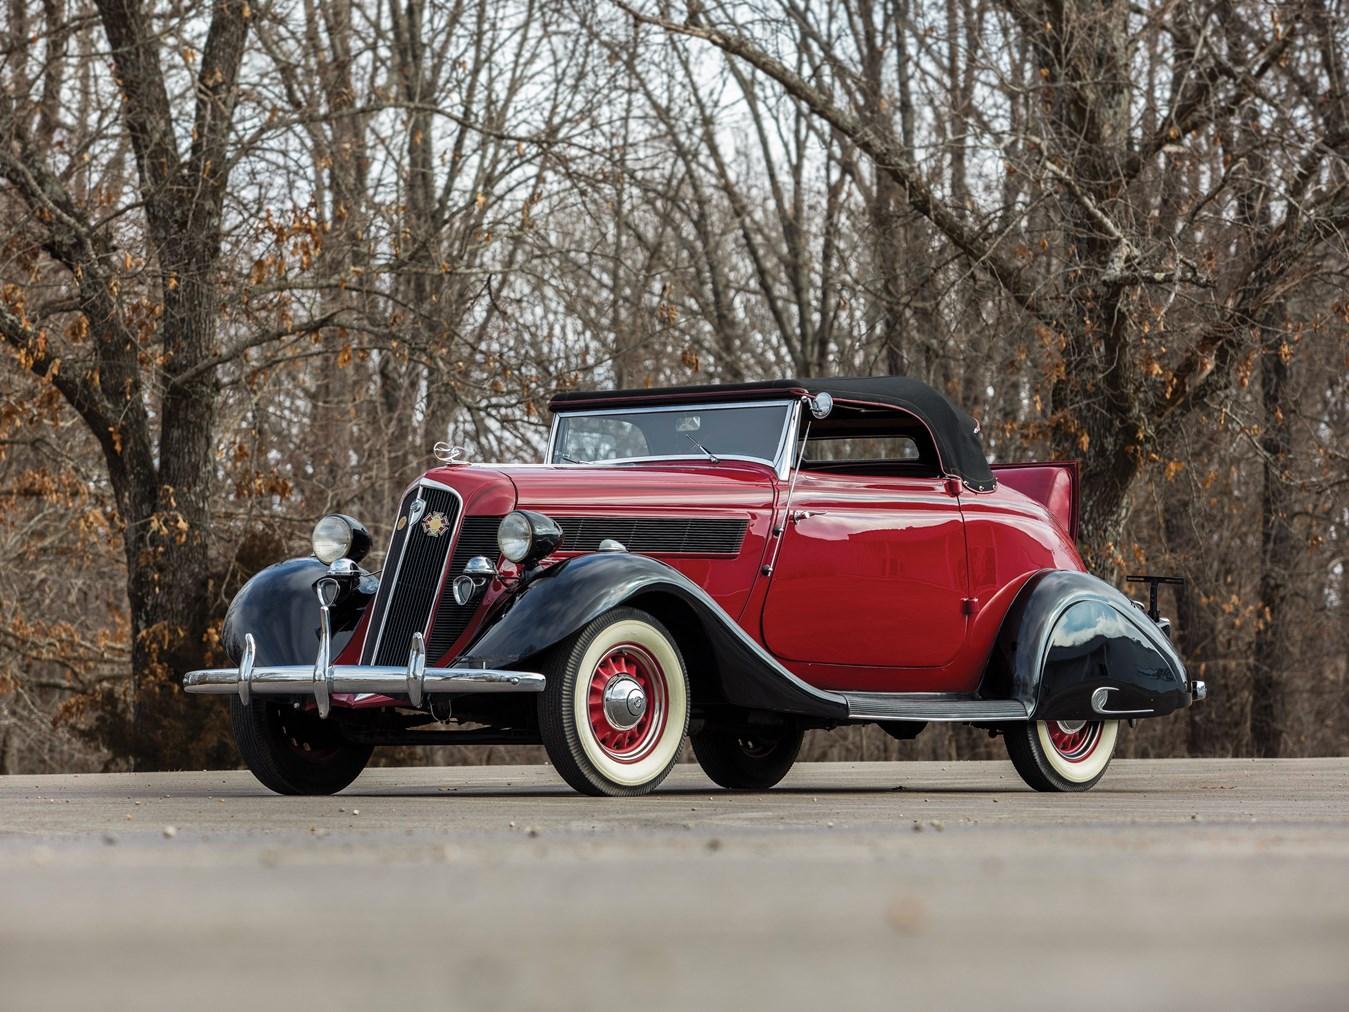 1935 Studebaker Dictator Roadster